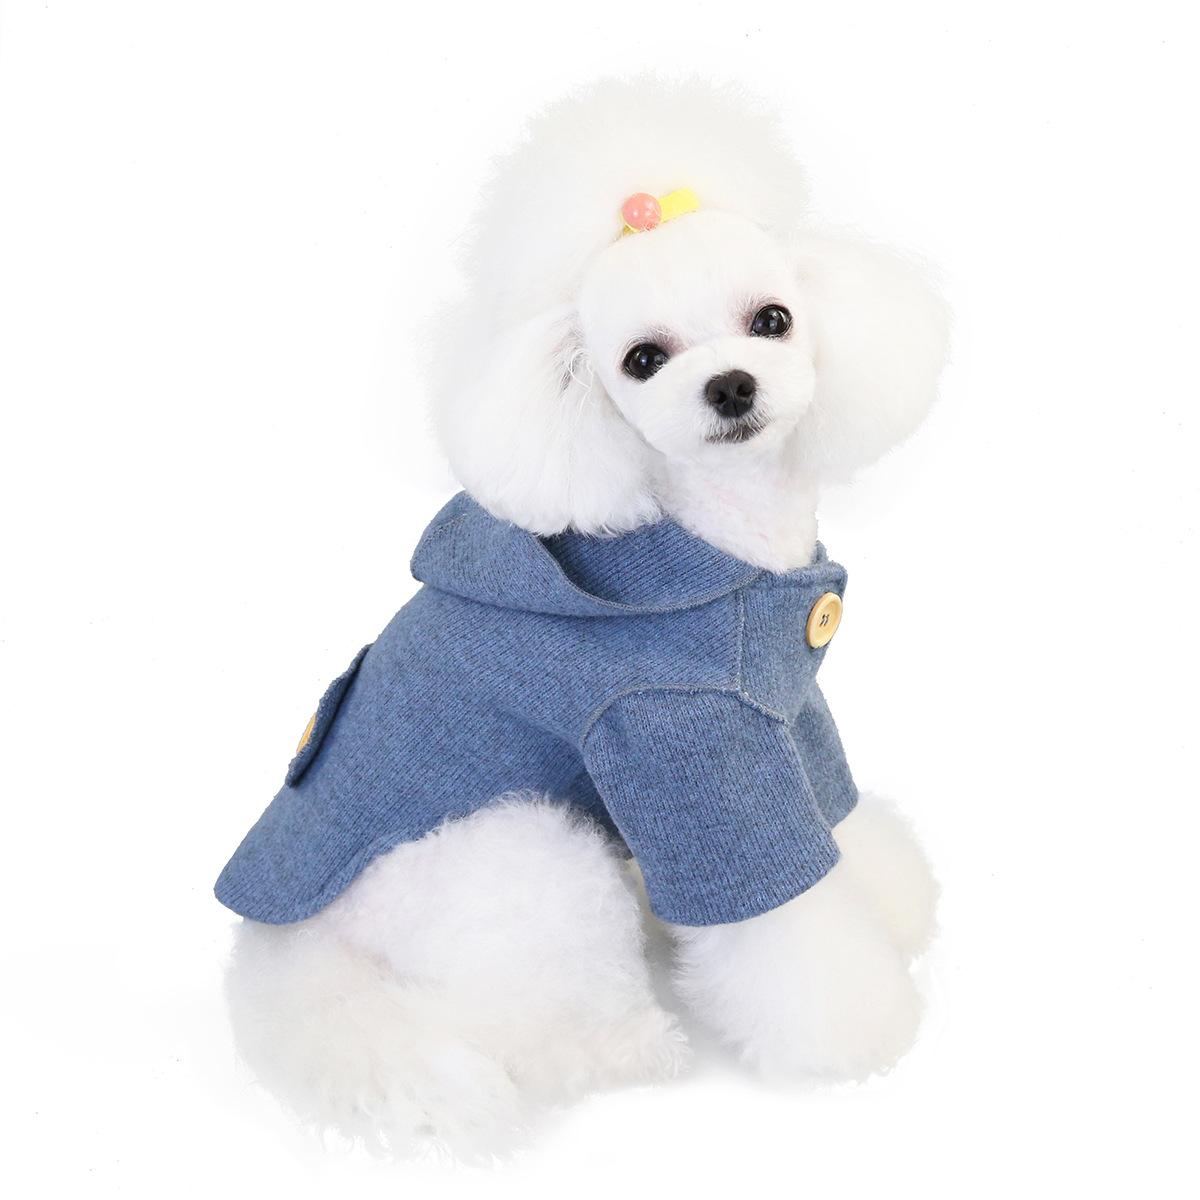 Pet clothing dog clothing autumn and winter new teddy dog pet clothing autumn and winter Korean woolen coat